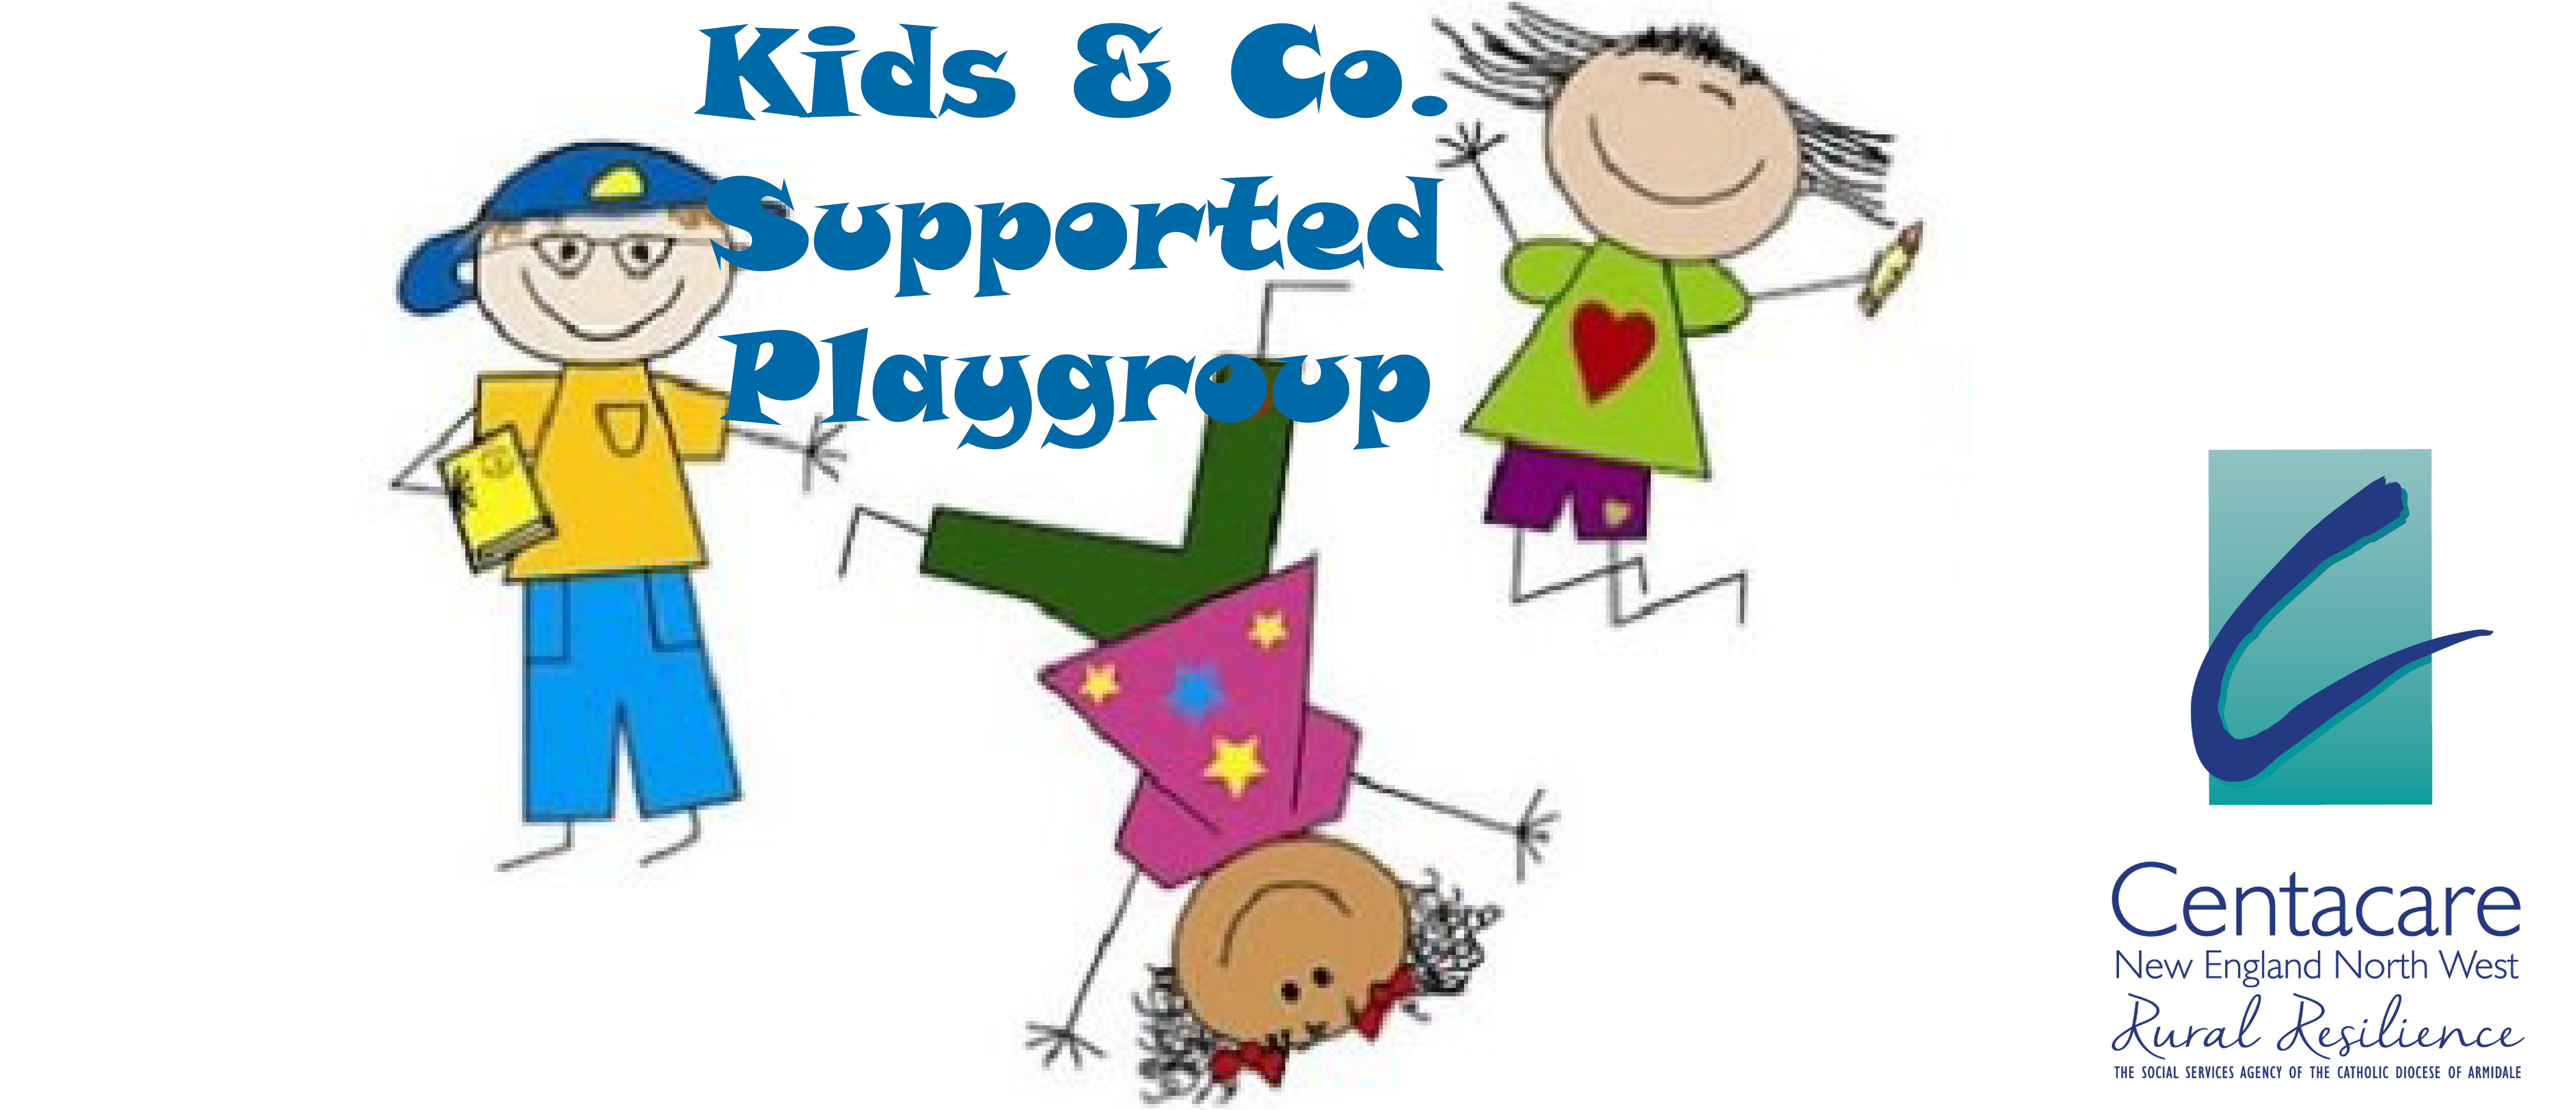 Kids & Co - Emmaville